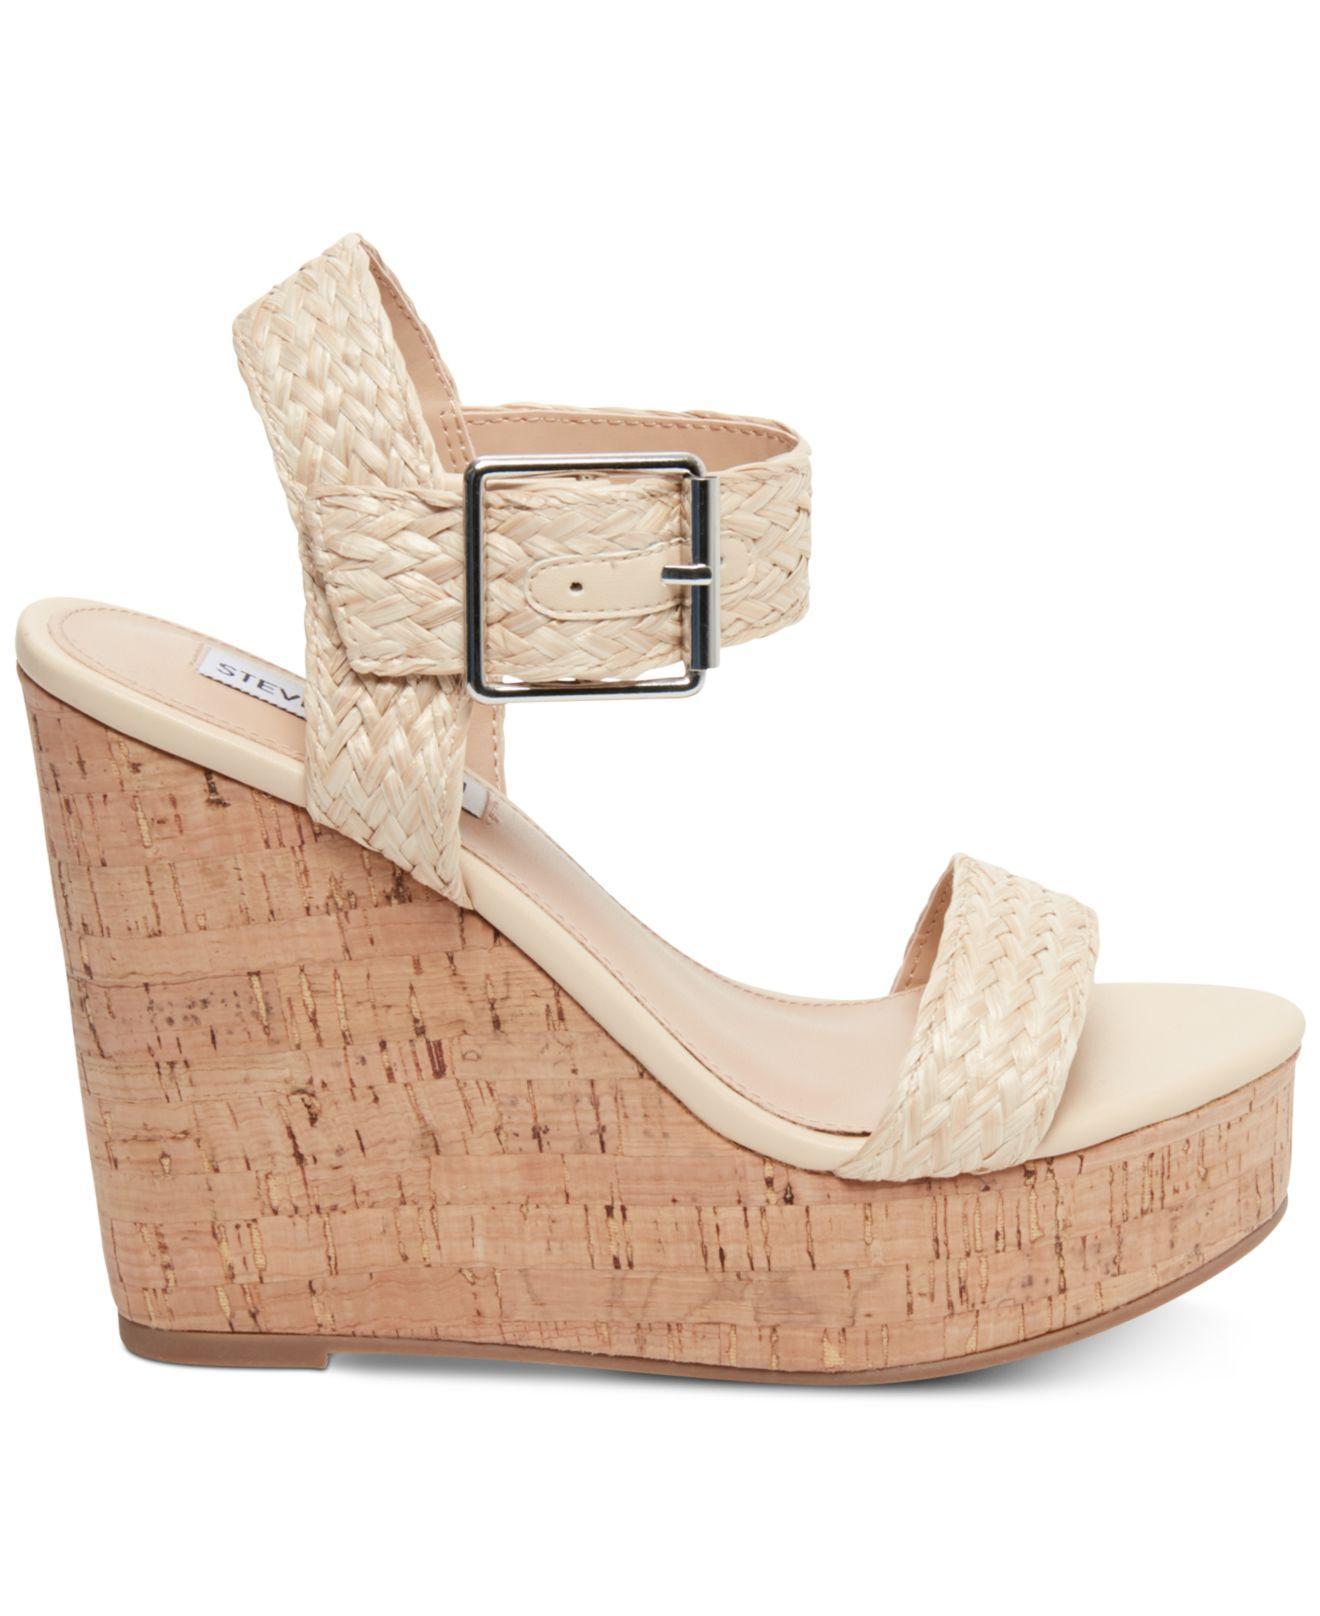 357e169b2a4 Lyst - Steve Madden Splash Platform Wedge Sandals in Natural